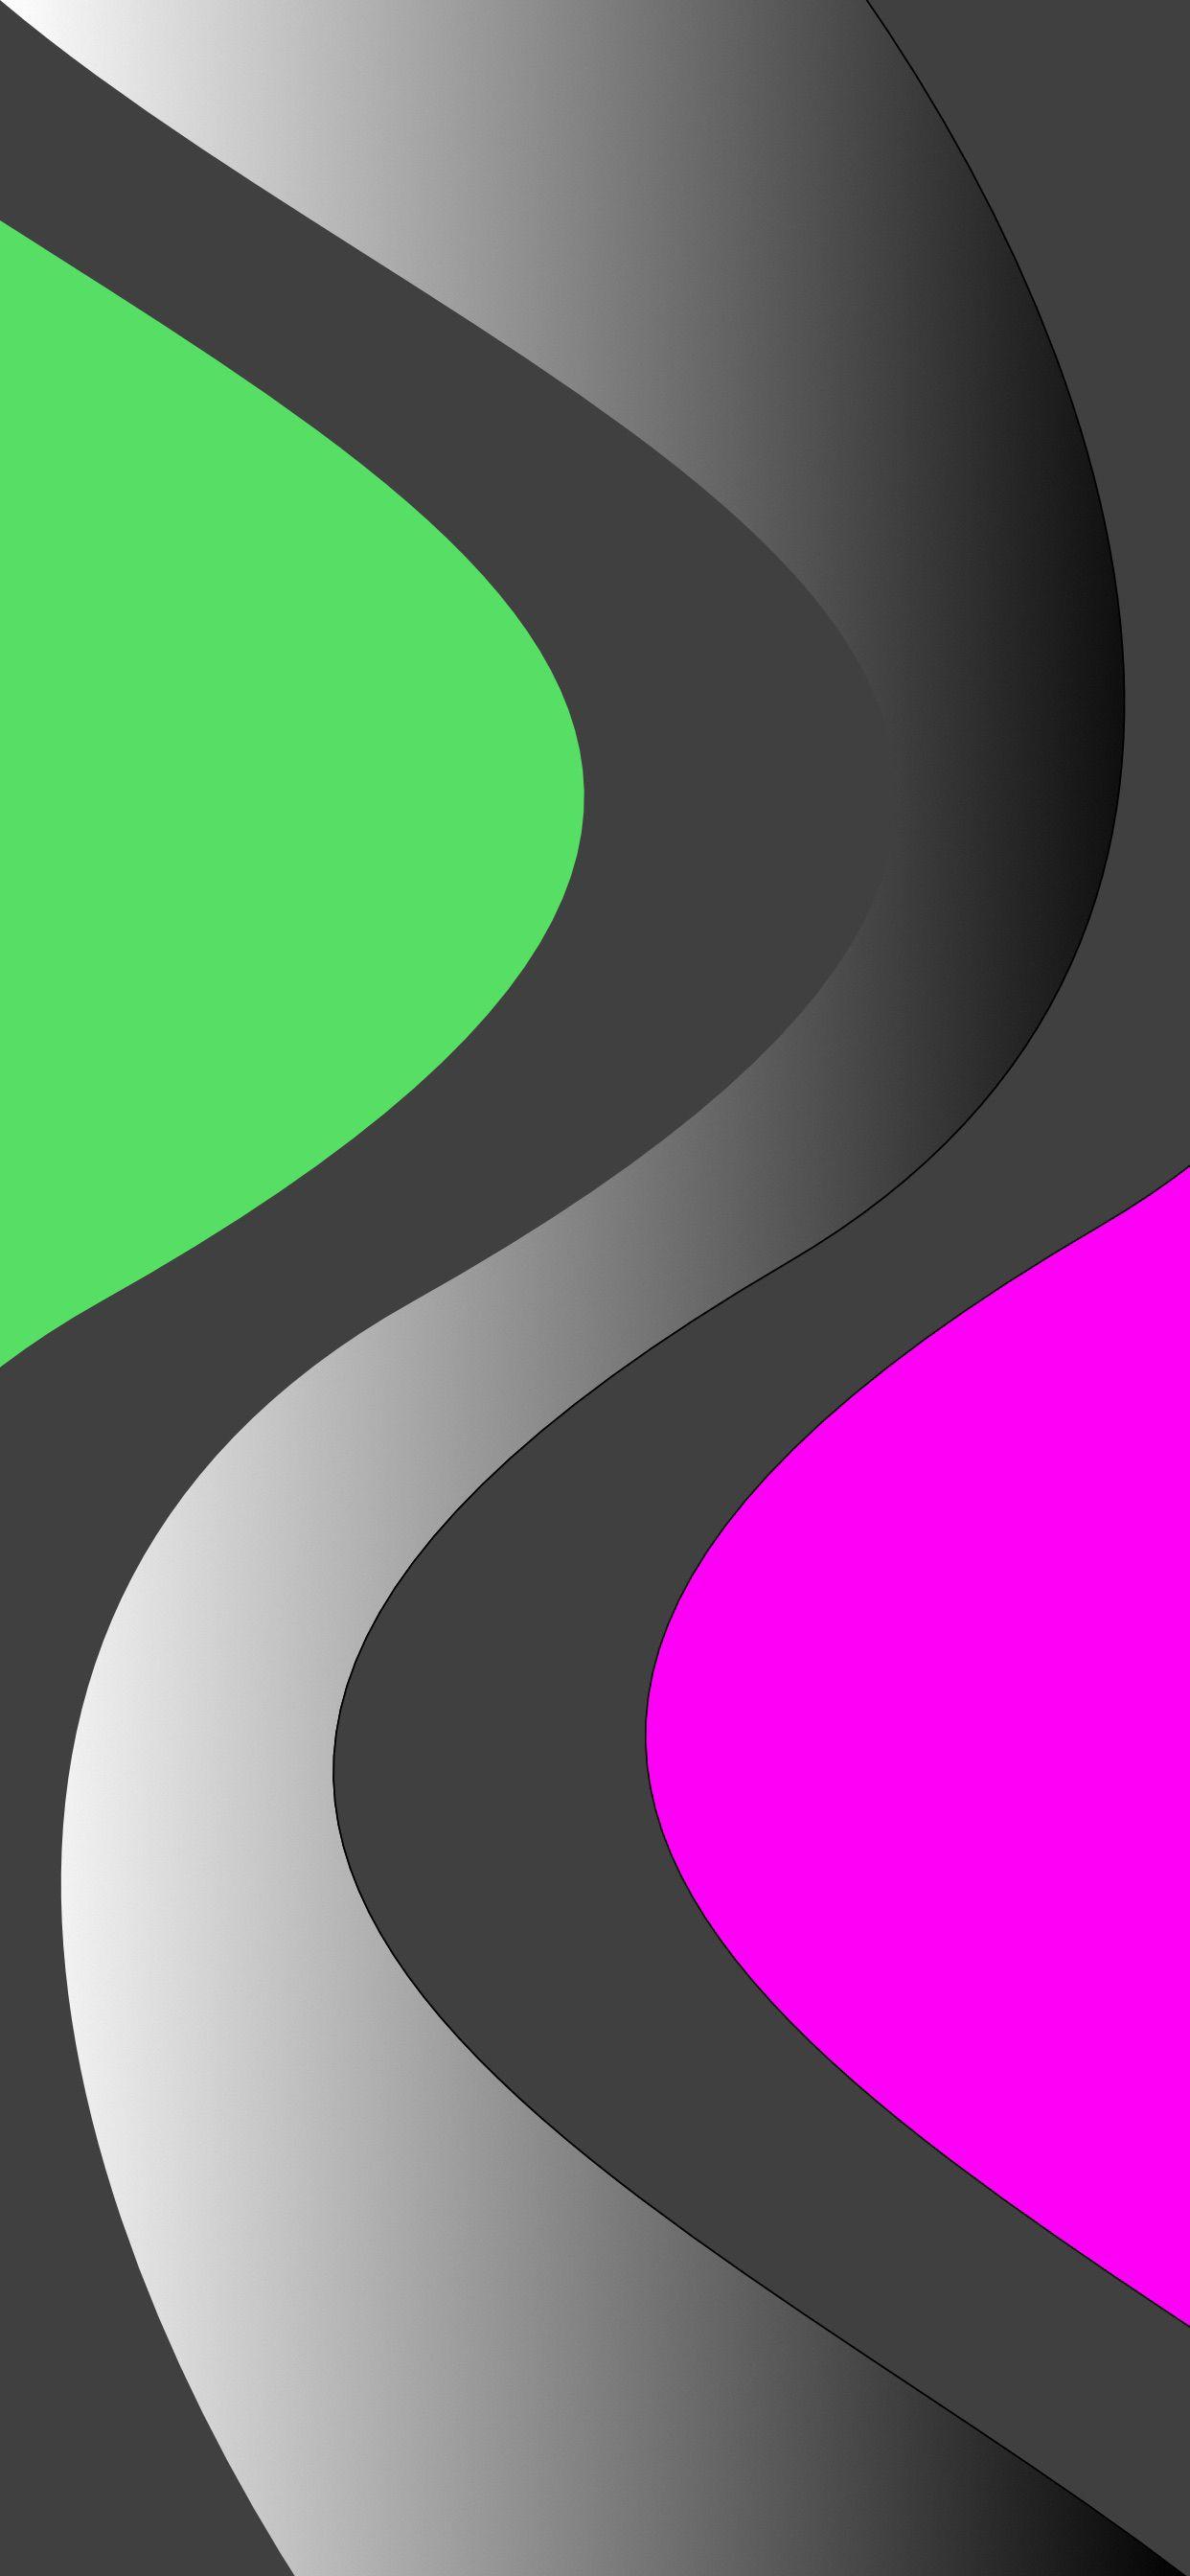 Abstract Wallpaper Designed By C Hotspot4u Iphone Iphonewallpaper